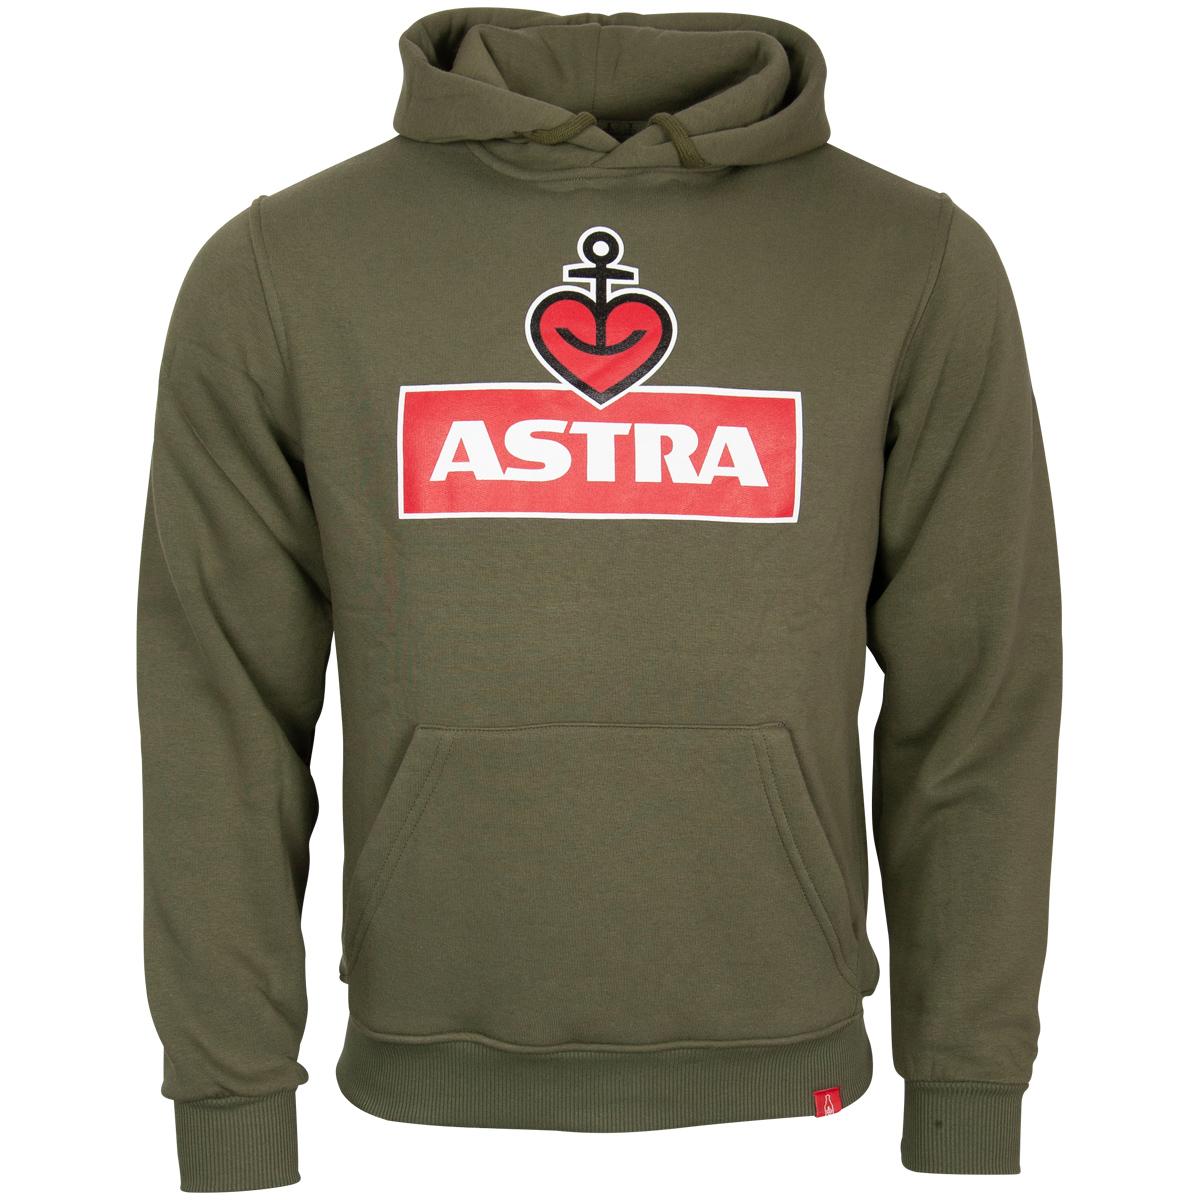 Astra - Kapuzenpullover Logo - unisex - oliv